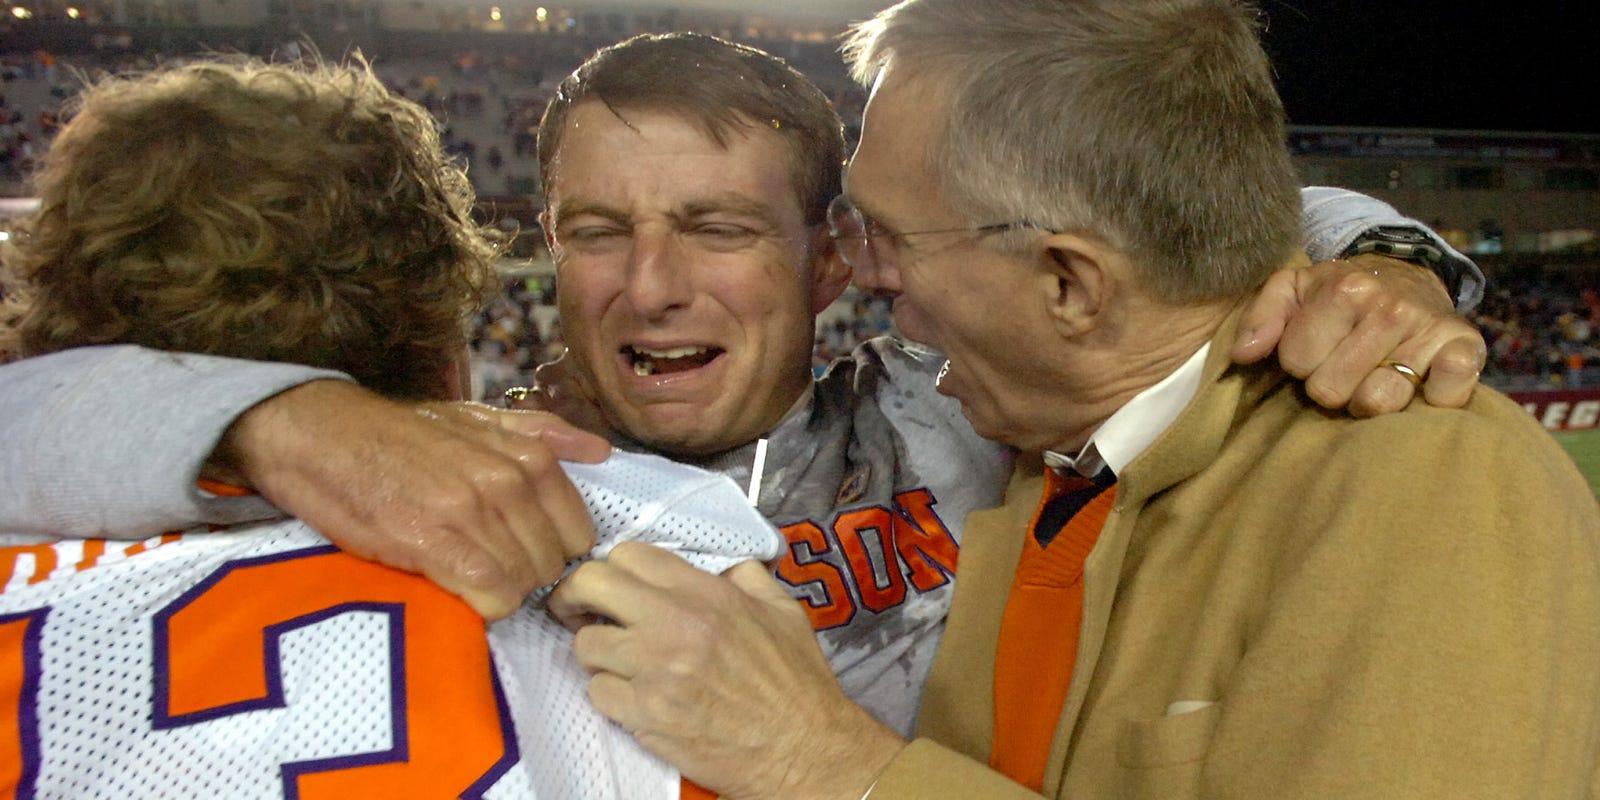 Lsu Vs Clemson It S A Super Bowl Of Interim Head Coaches